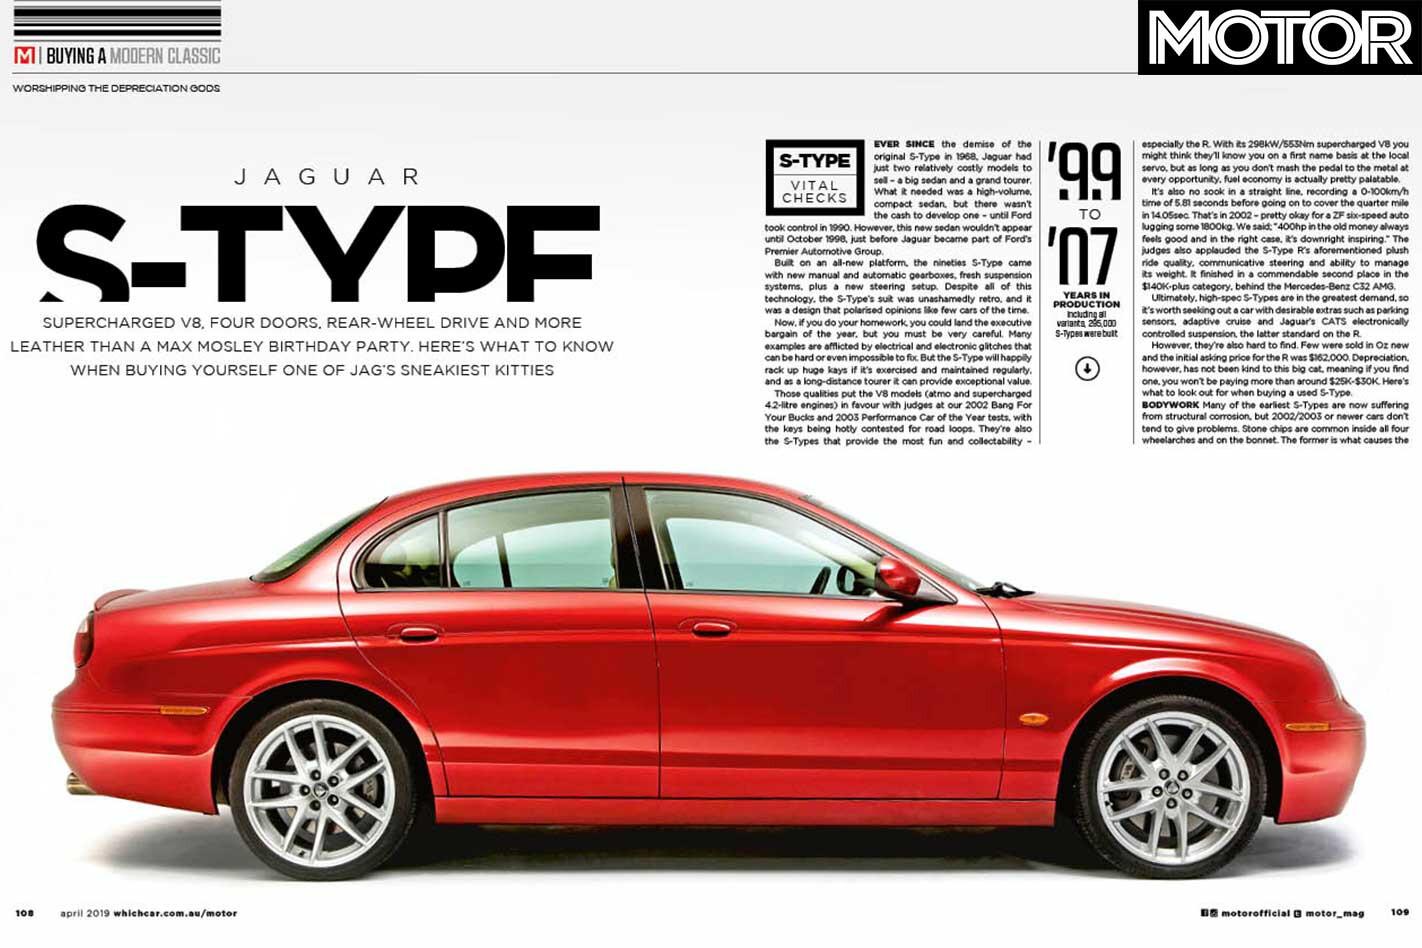 MOTOR Magazine April 2019 Issue JAGUAR S TYPE R Used Car Feature Jpg